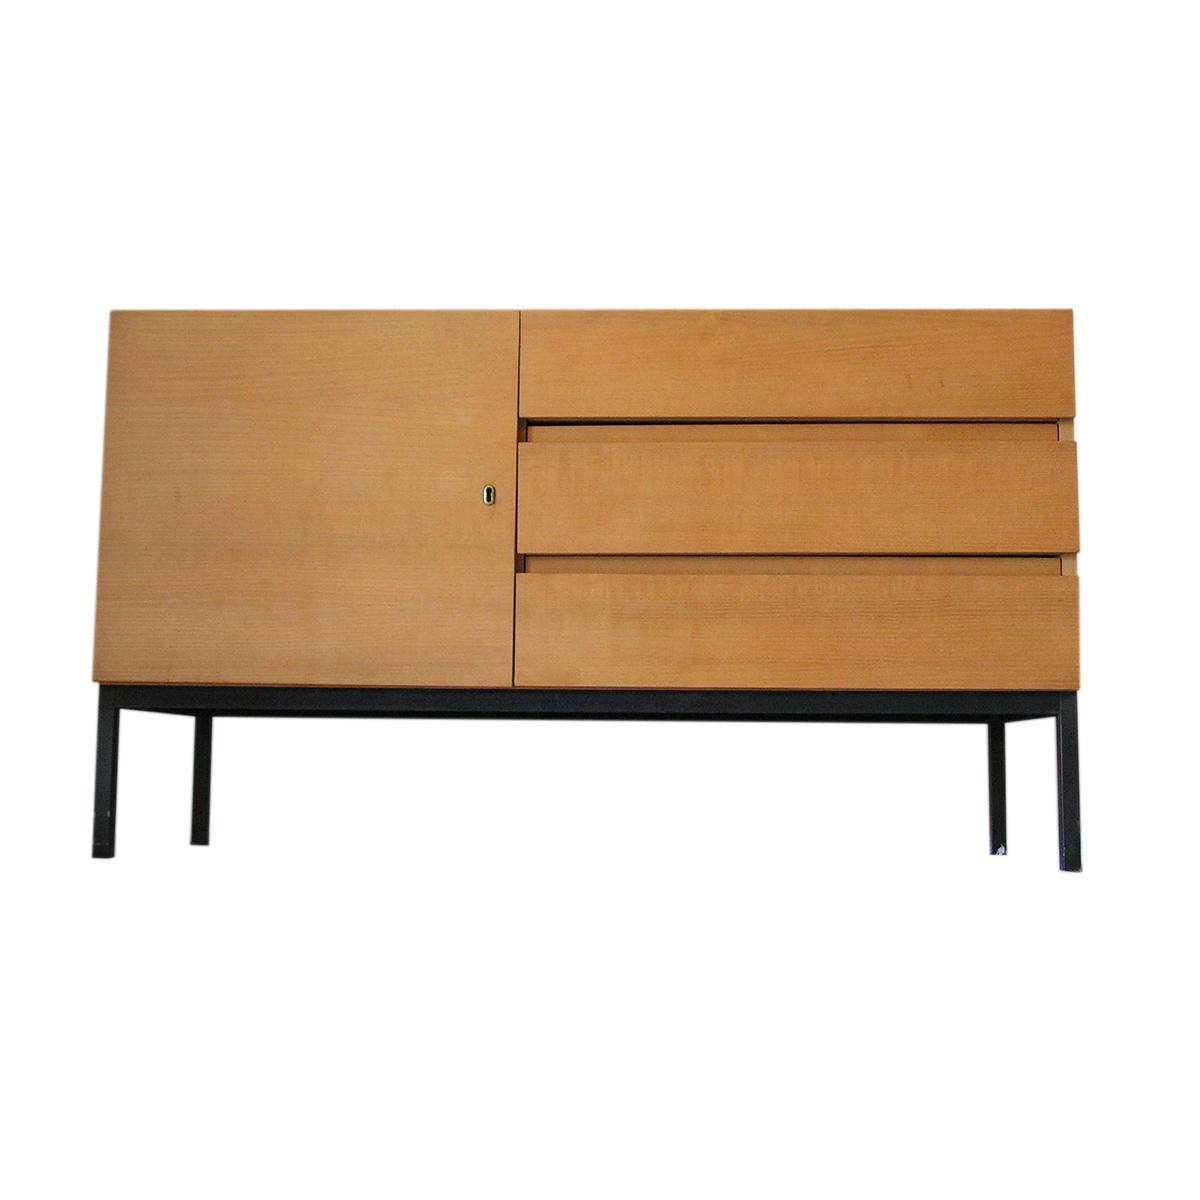 sideboard-victoria-small-oak-swiss-design-baar-vintage